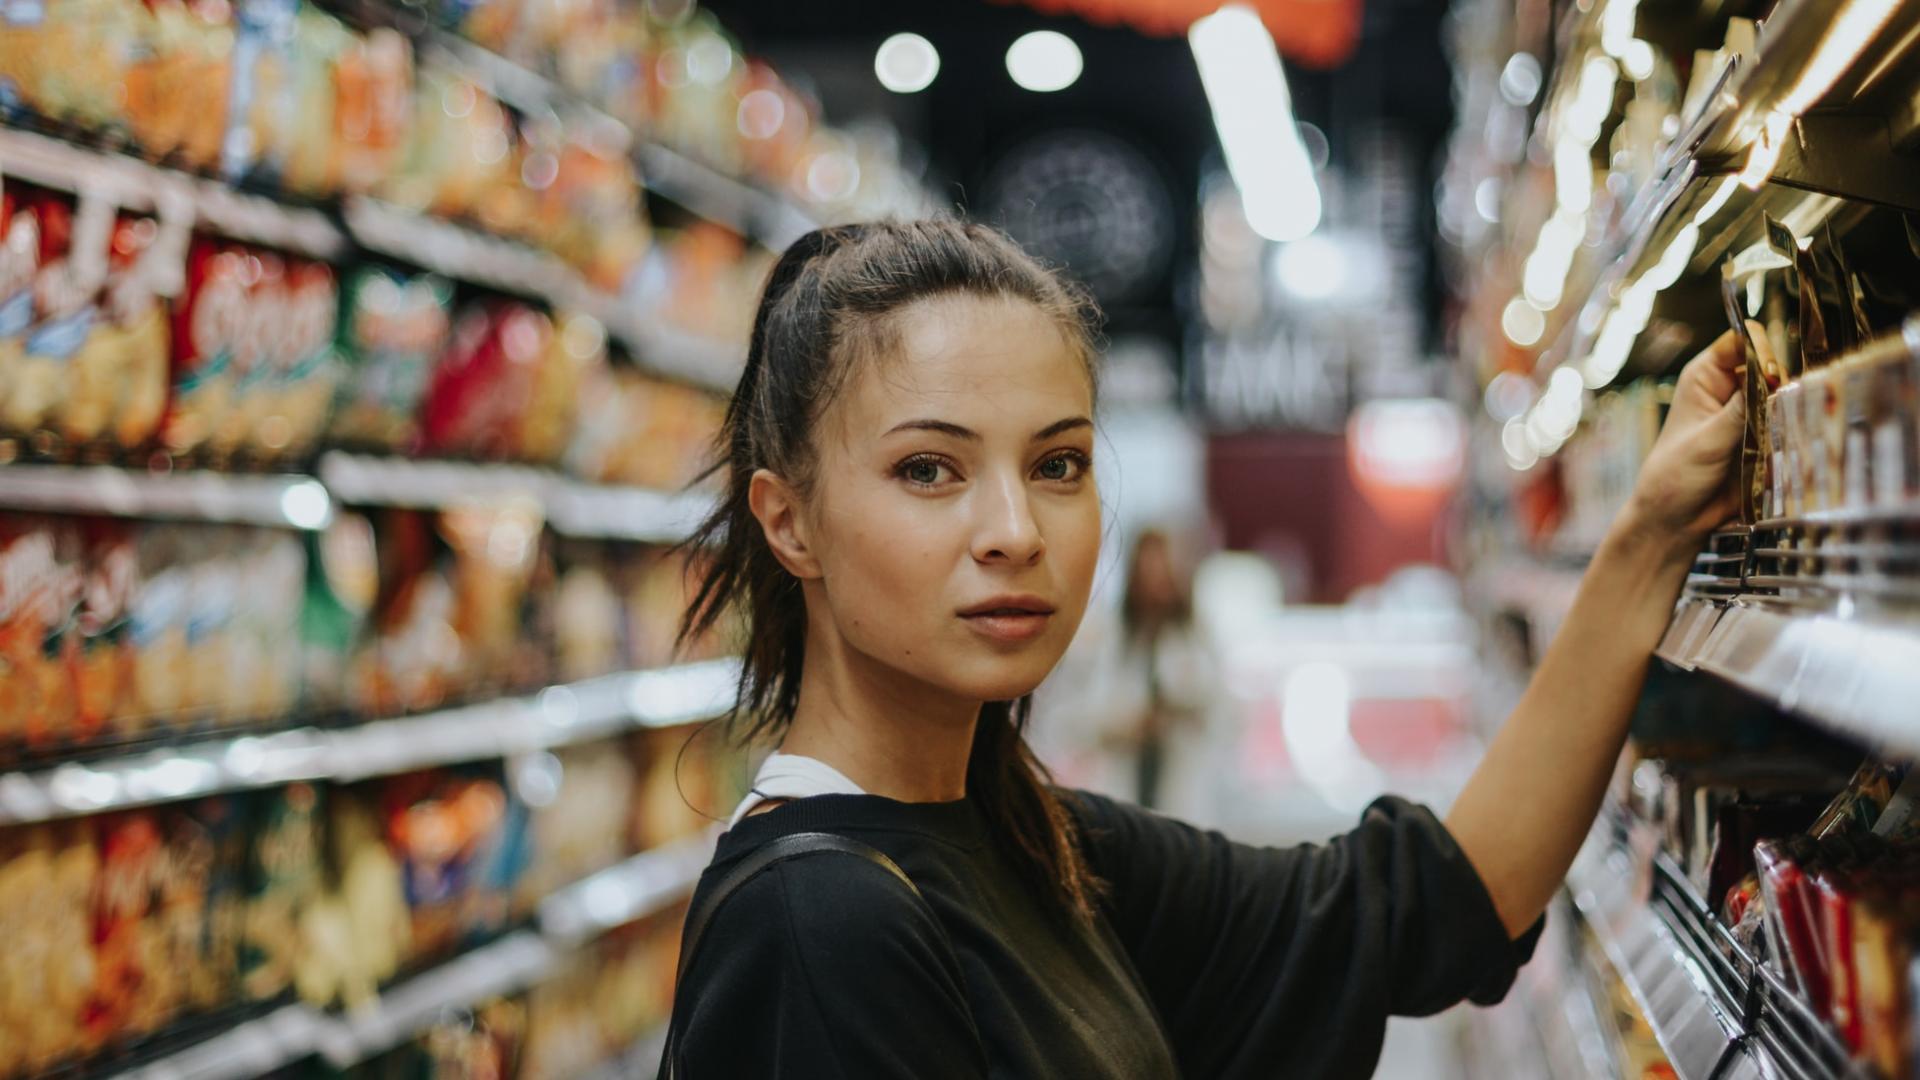 Verpackung, Supermarkt